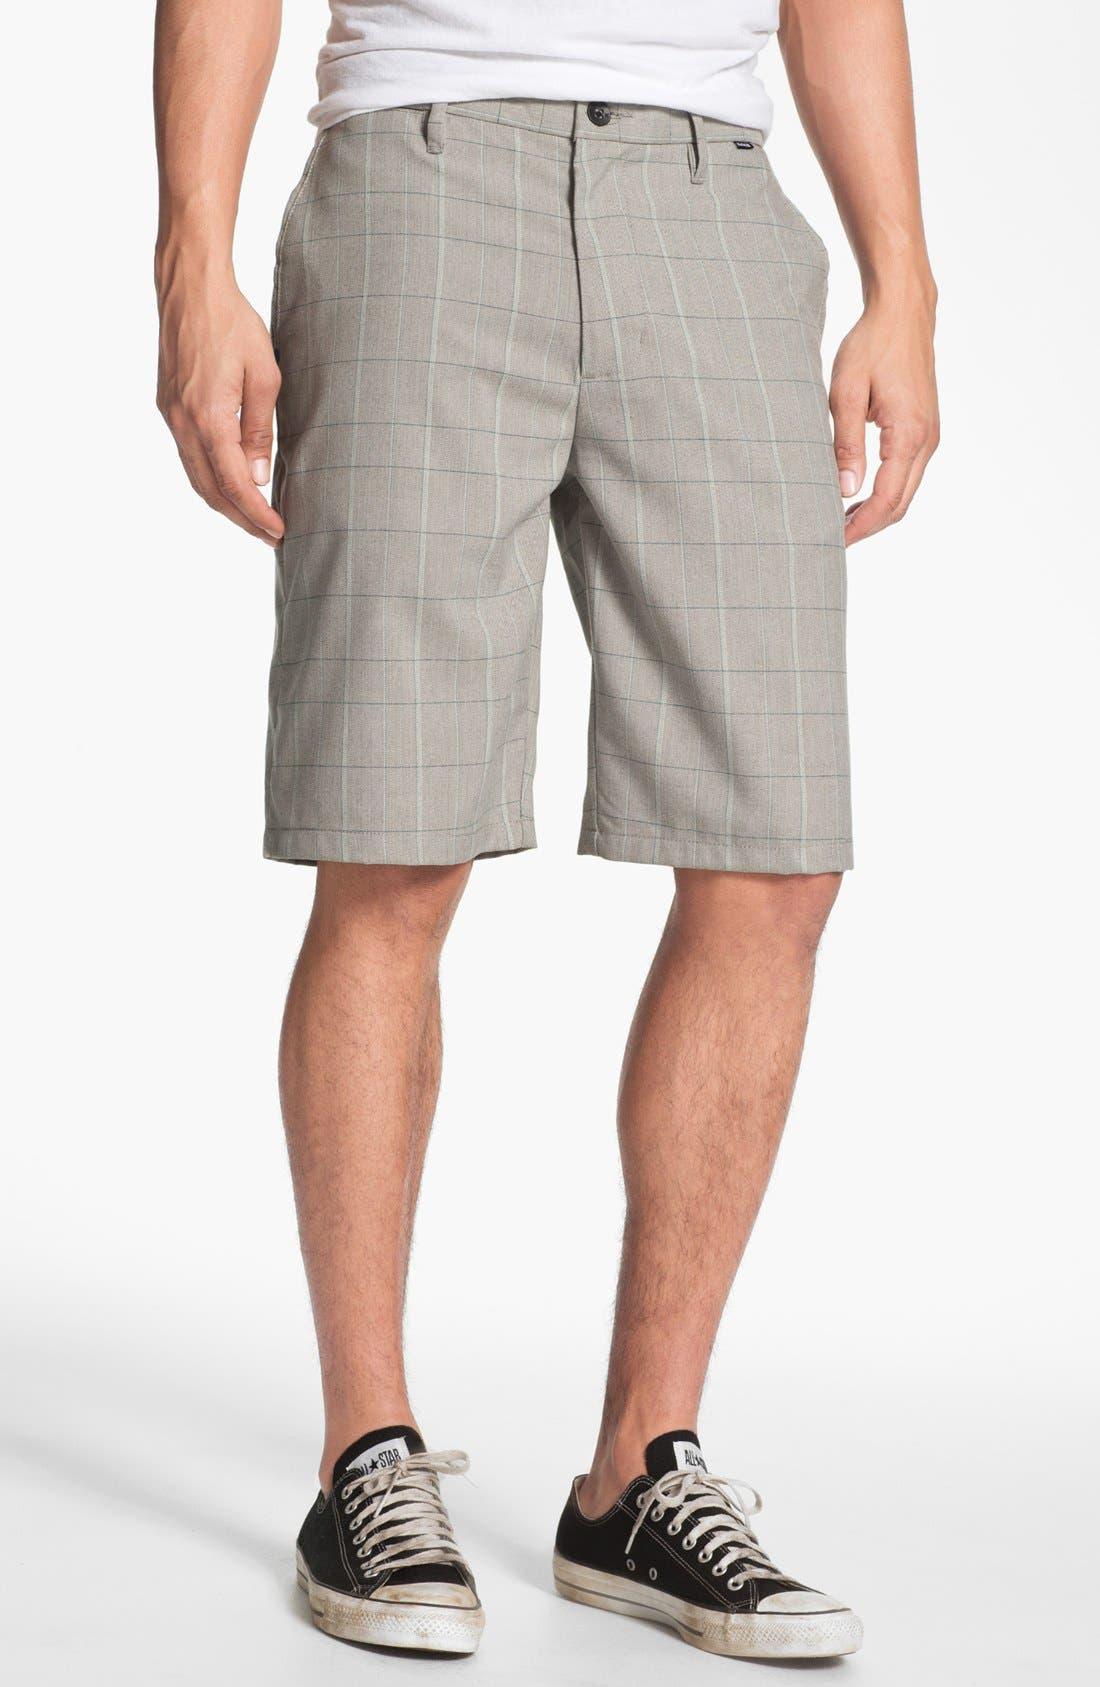 Alternate Image 1 Selected - Hurley 'Puerta Nueva' Shorts